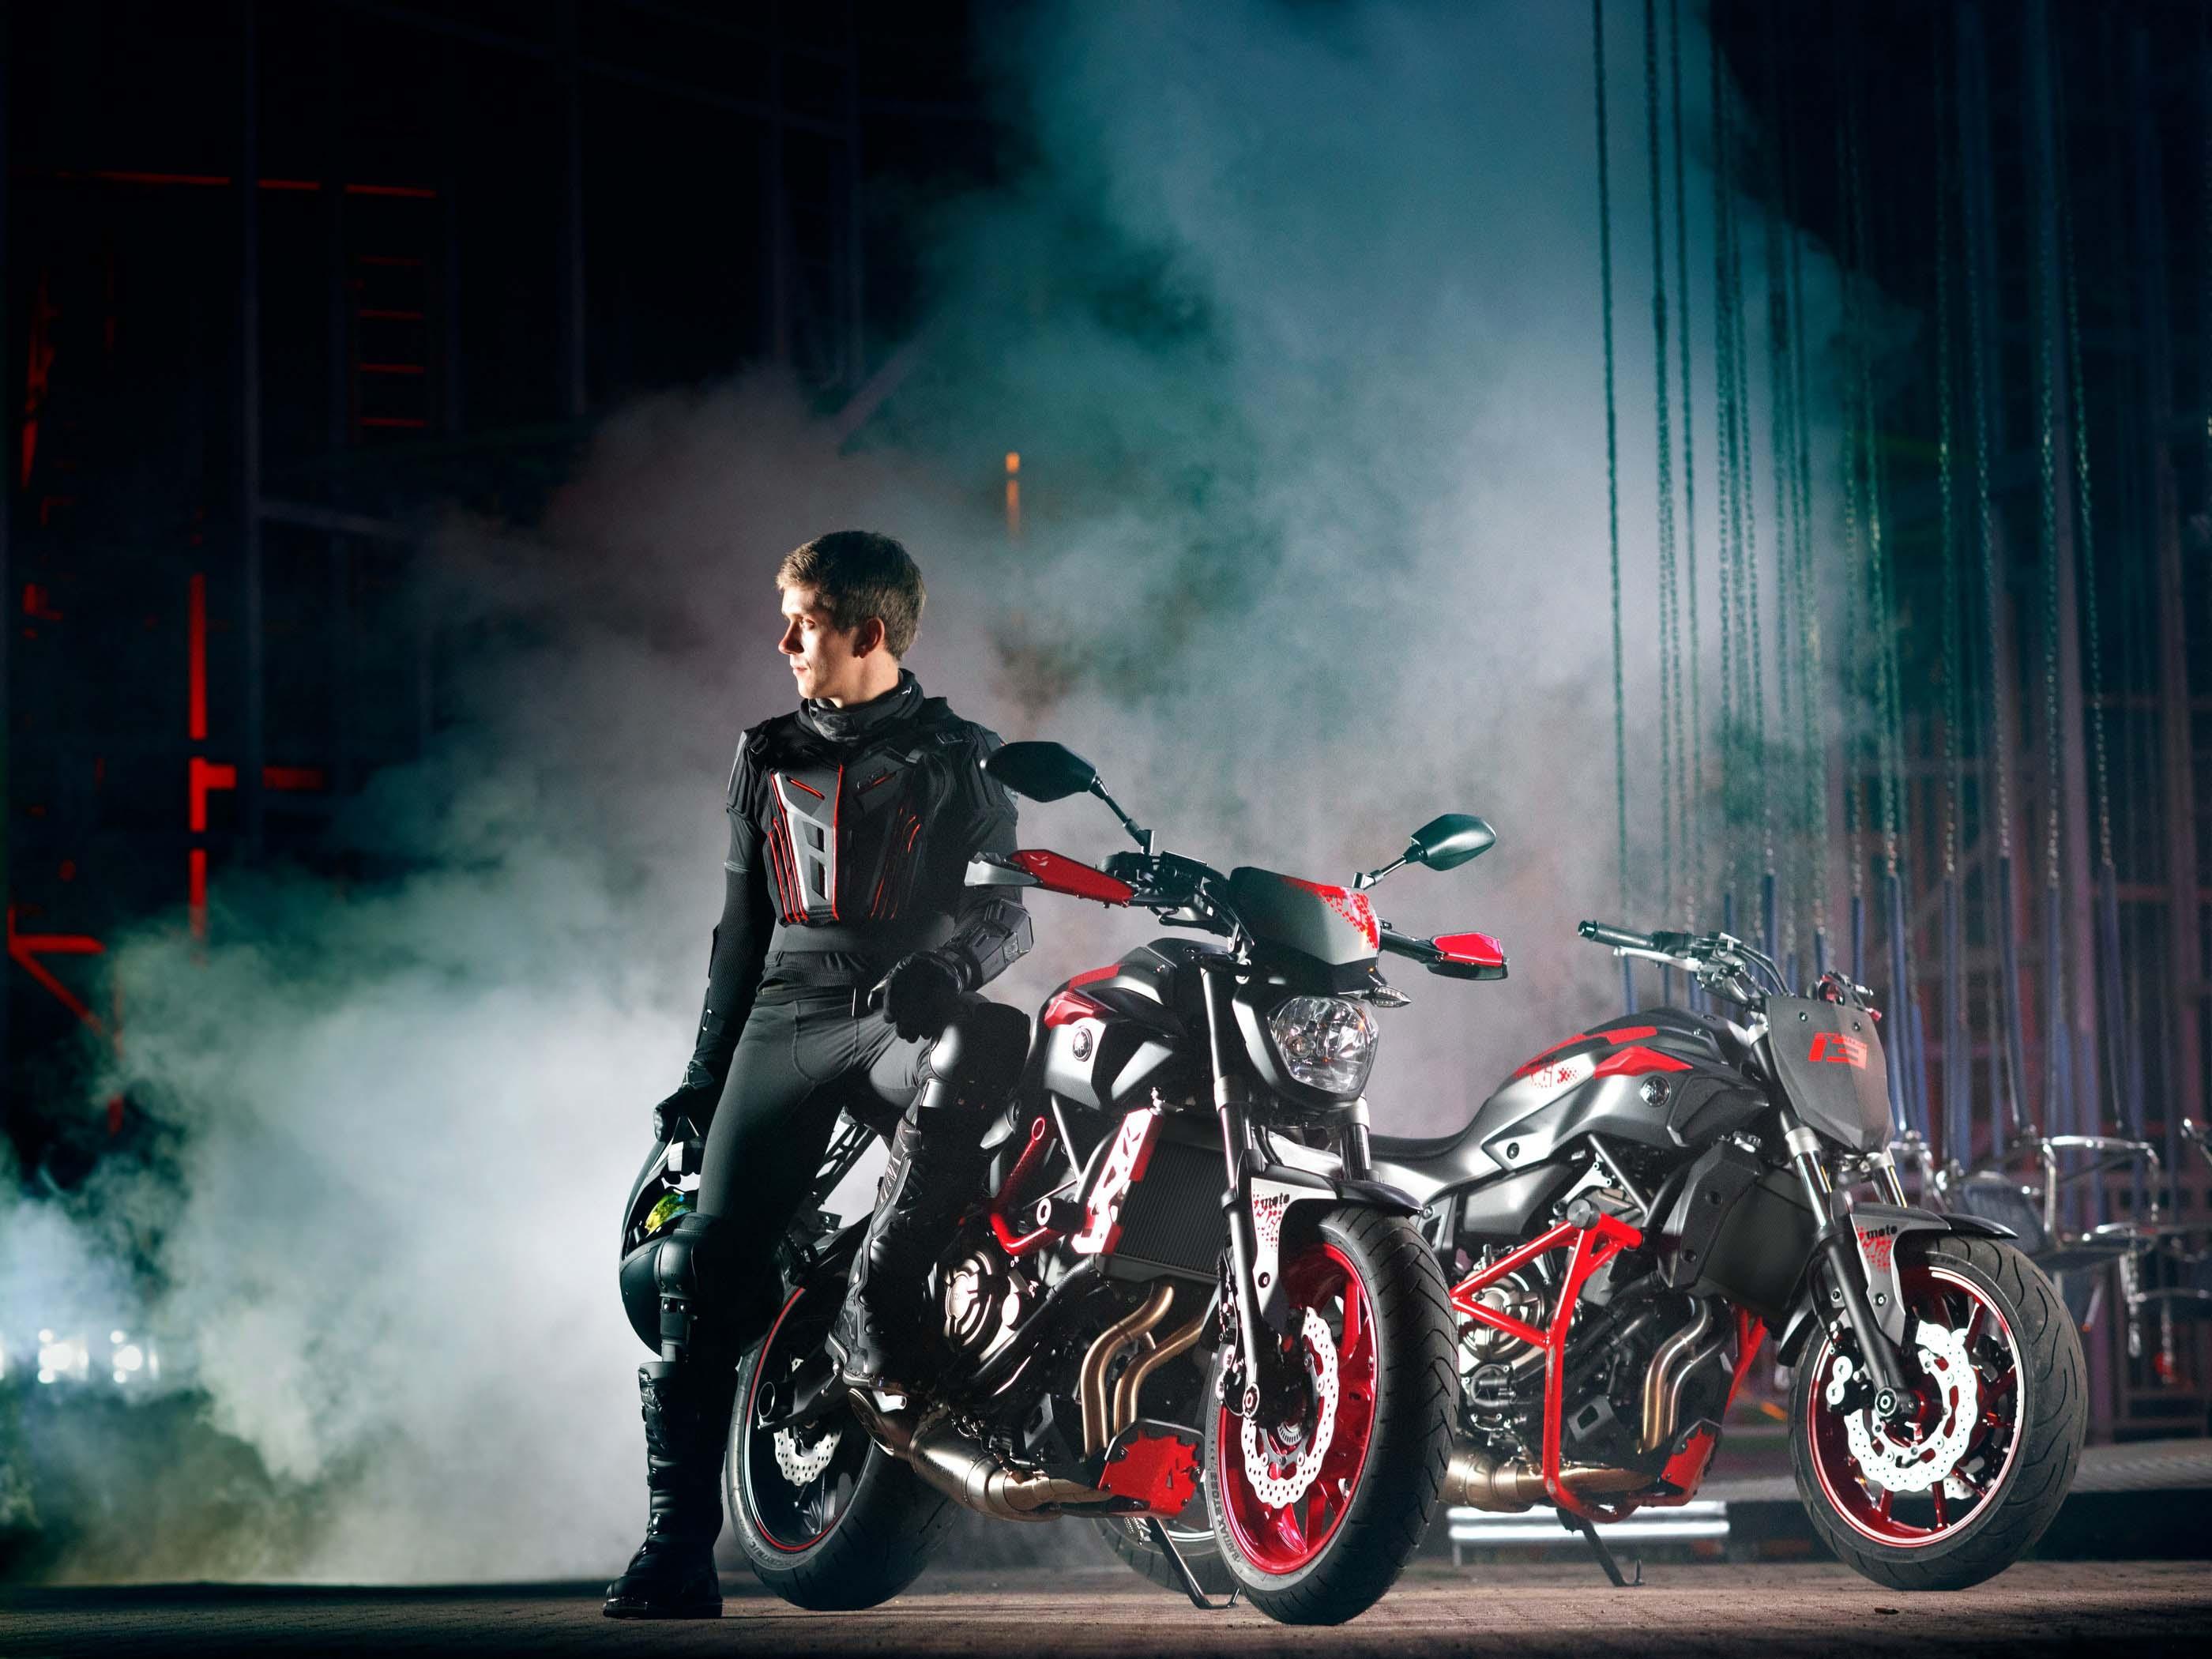 2015 Yamaha MT-07 Moto Cage - For Euro Stunters - Asphalt